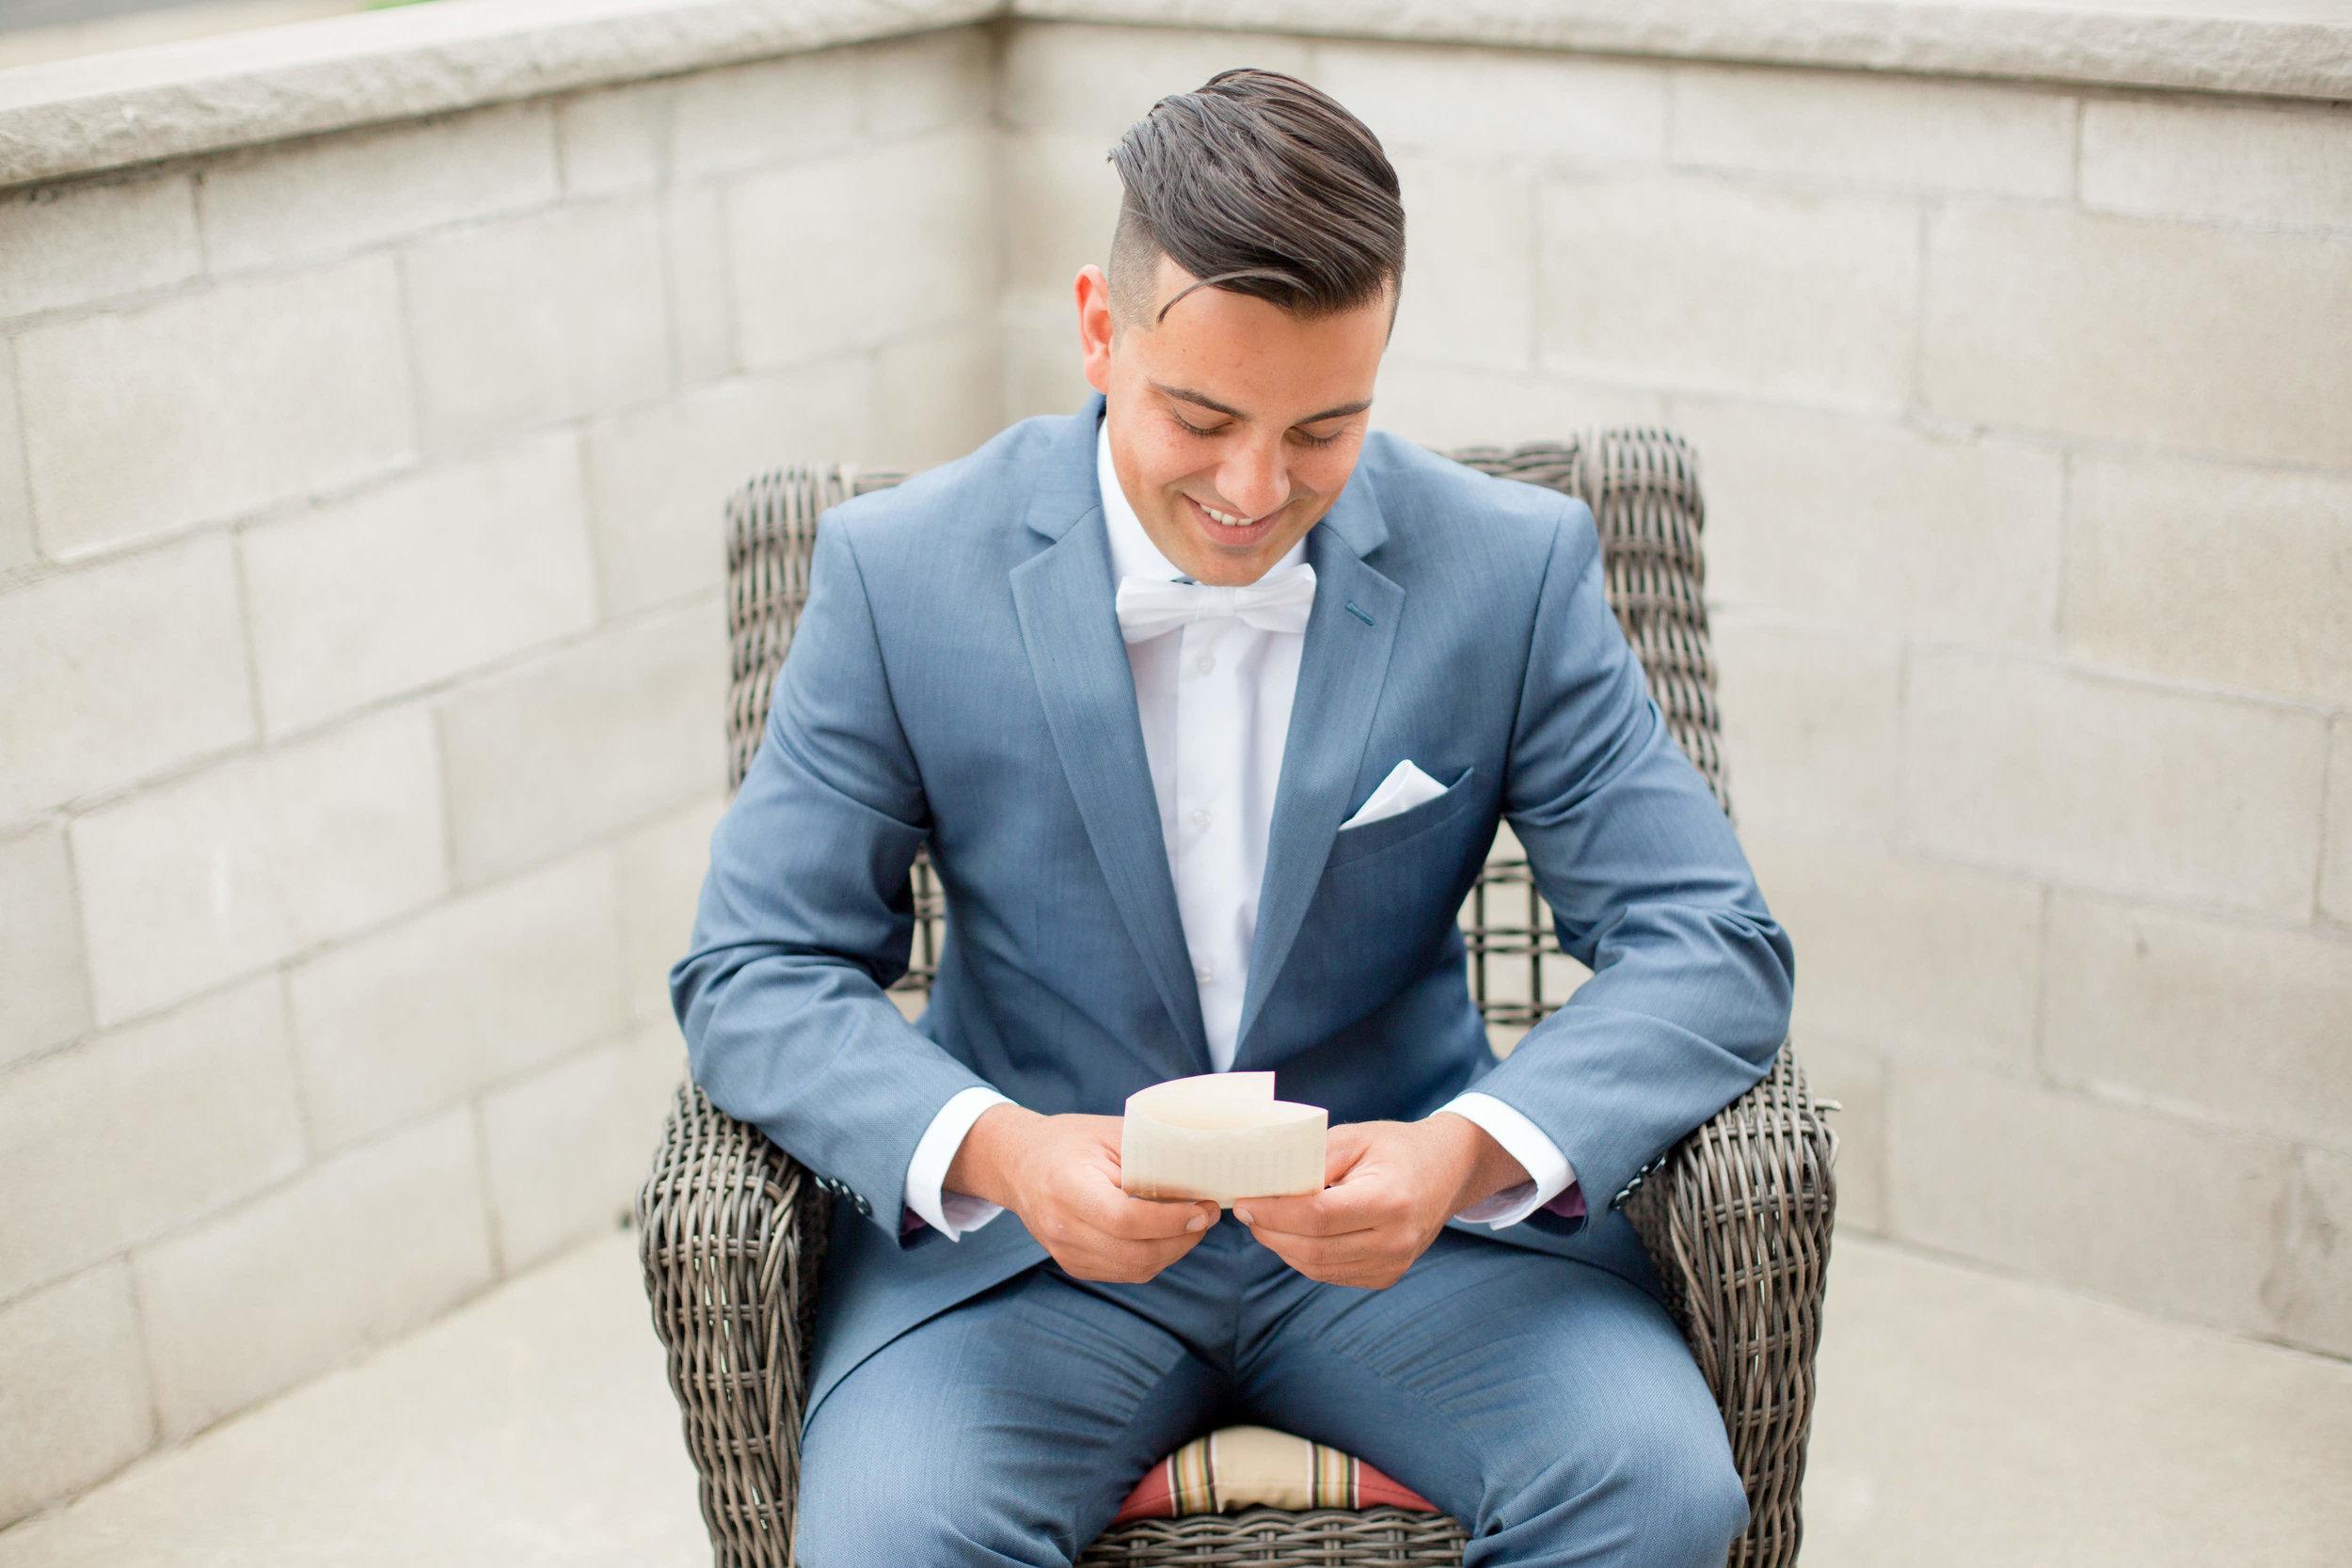 Miranda___Daniel___Daniel_Ricci_Weddings___High_Res._Finals_44.jpg